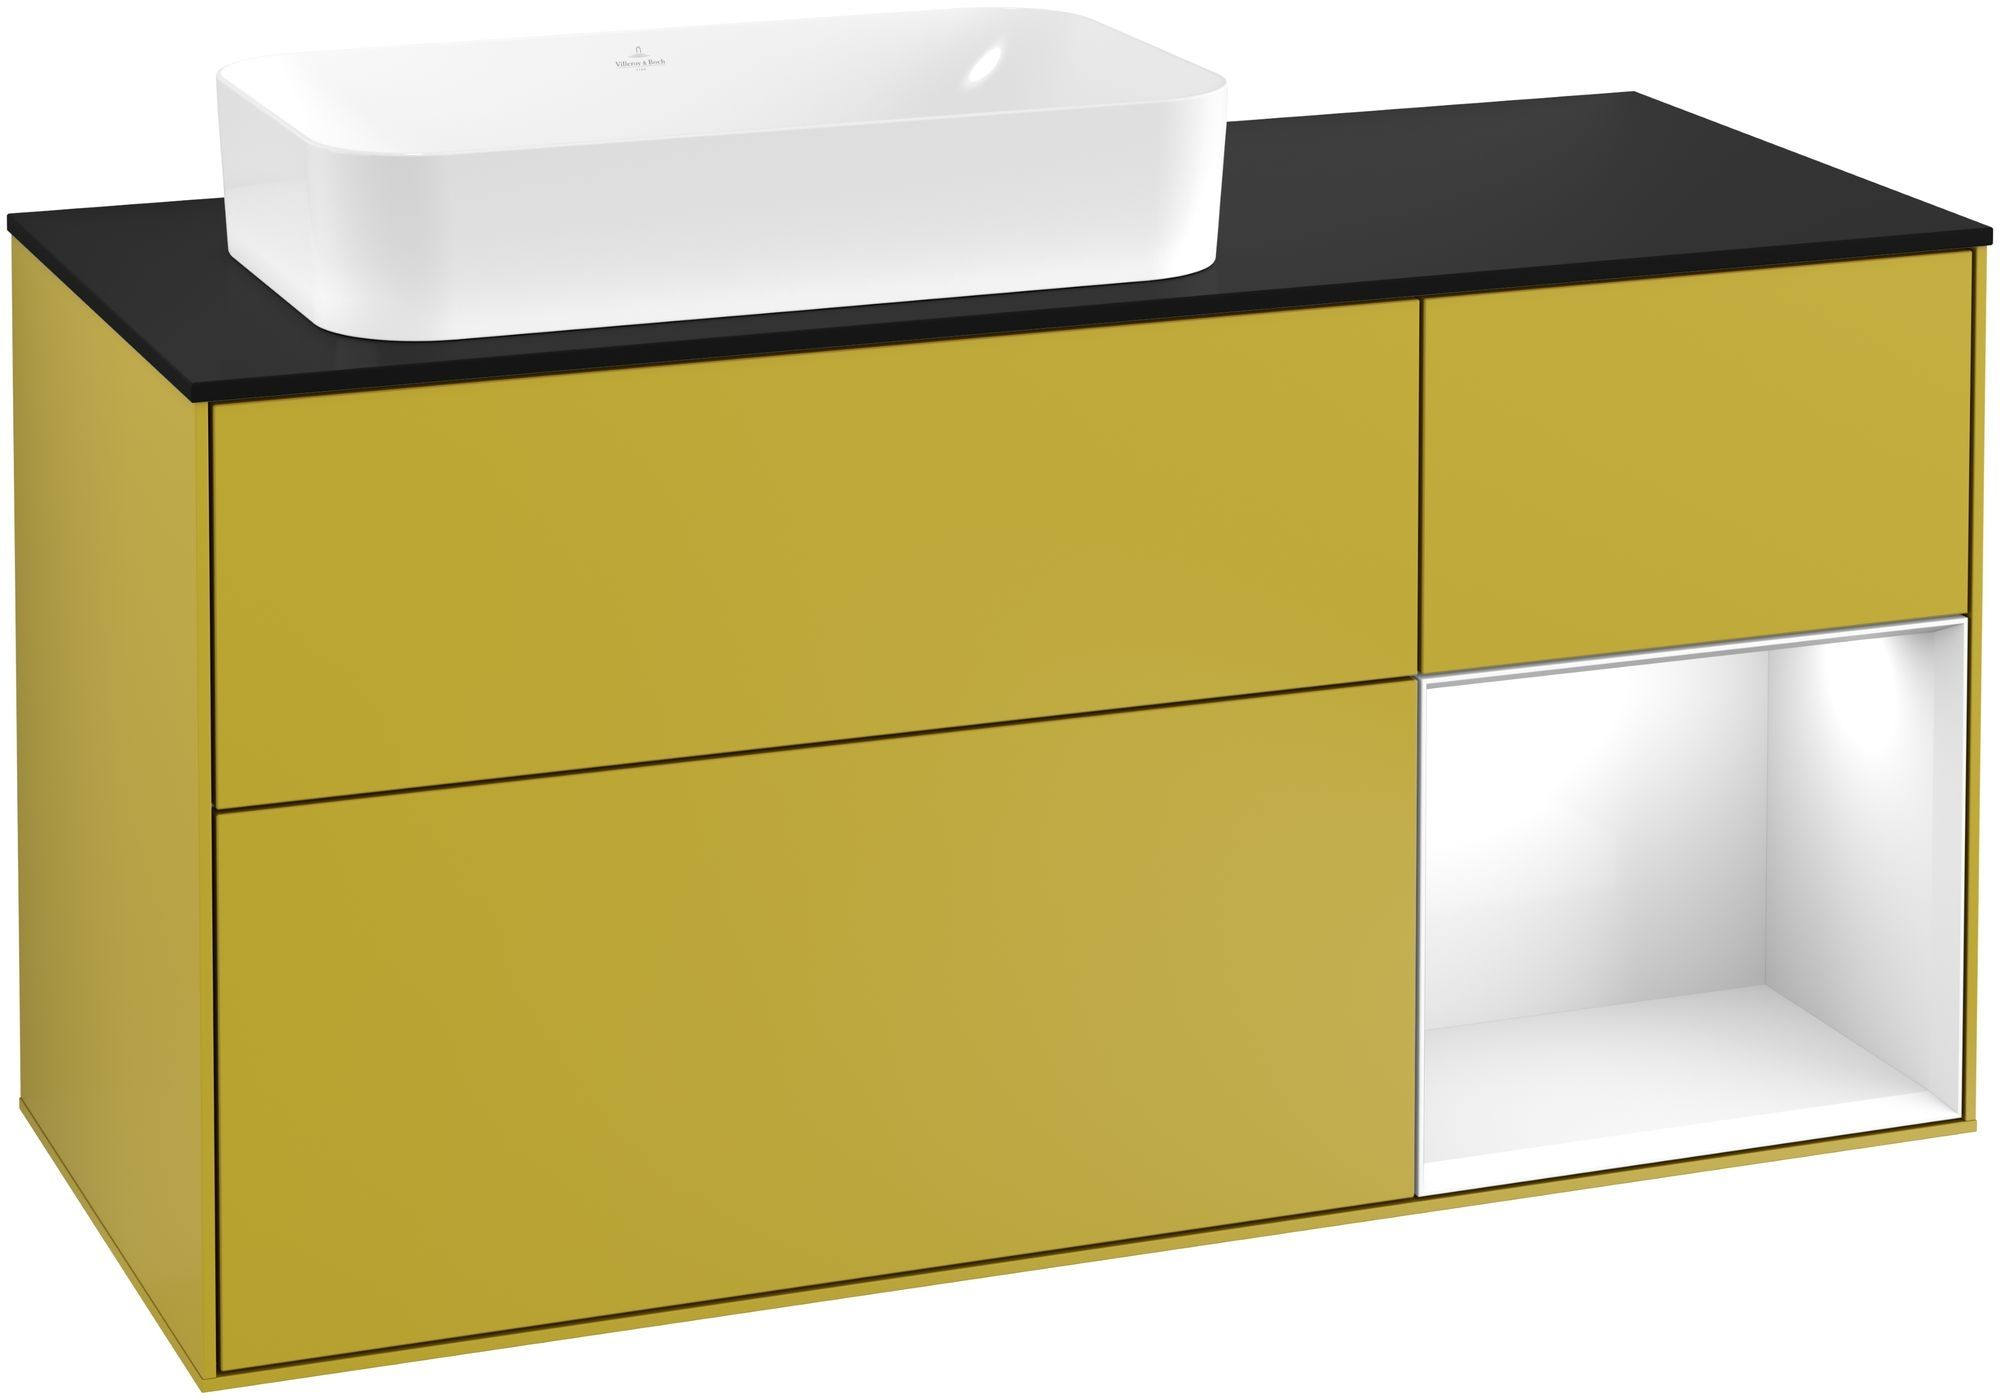 Villeroy & Boch Finion G28 Waschtischunterschrank mit Regalelement 3 Auszüge Waschtisch links LED-Beleuchtung B:120xH:60,3xT:50,1cm Front, Korpus: Sun, Regal: Glossy White Lack, Glasplatte: Black Matt G282GFHE